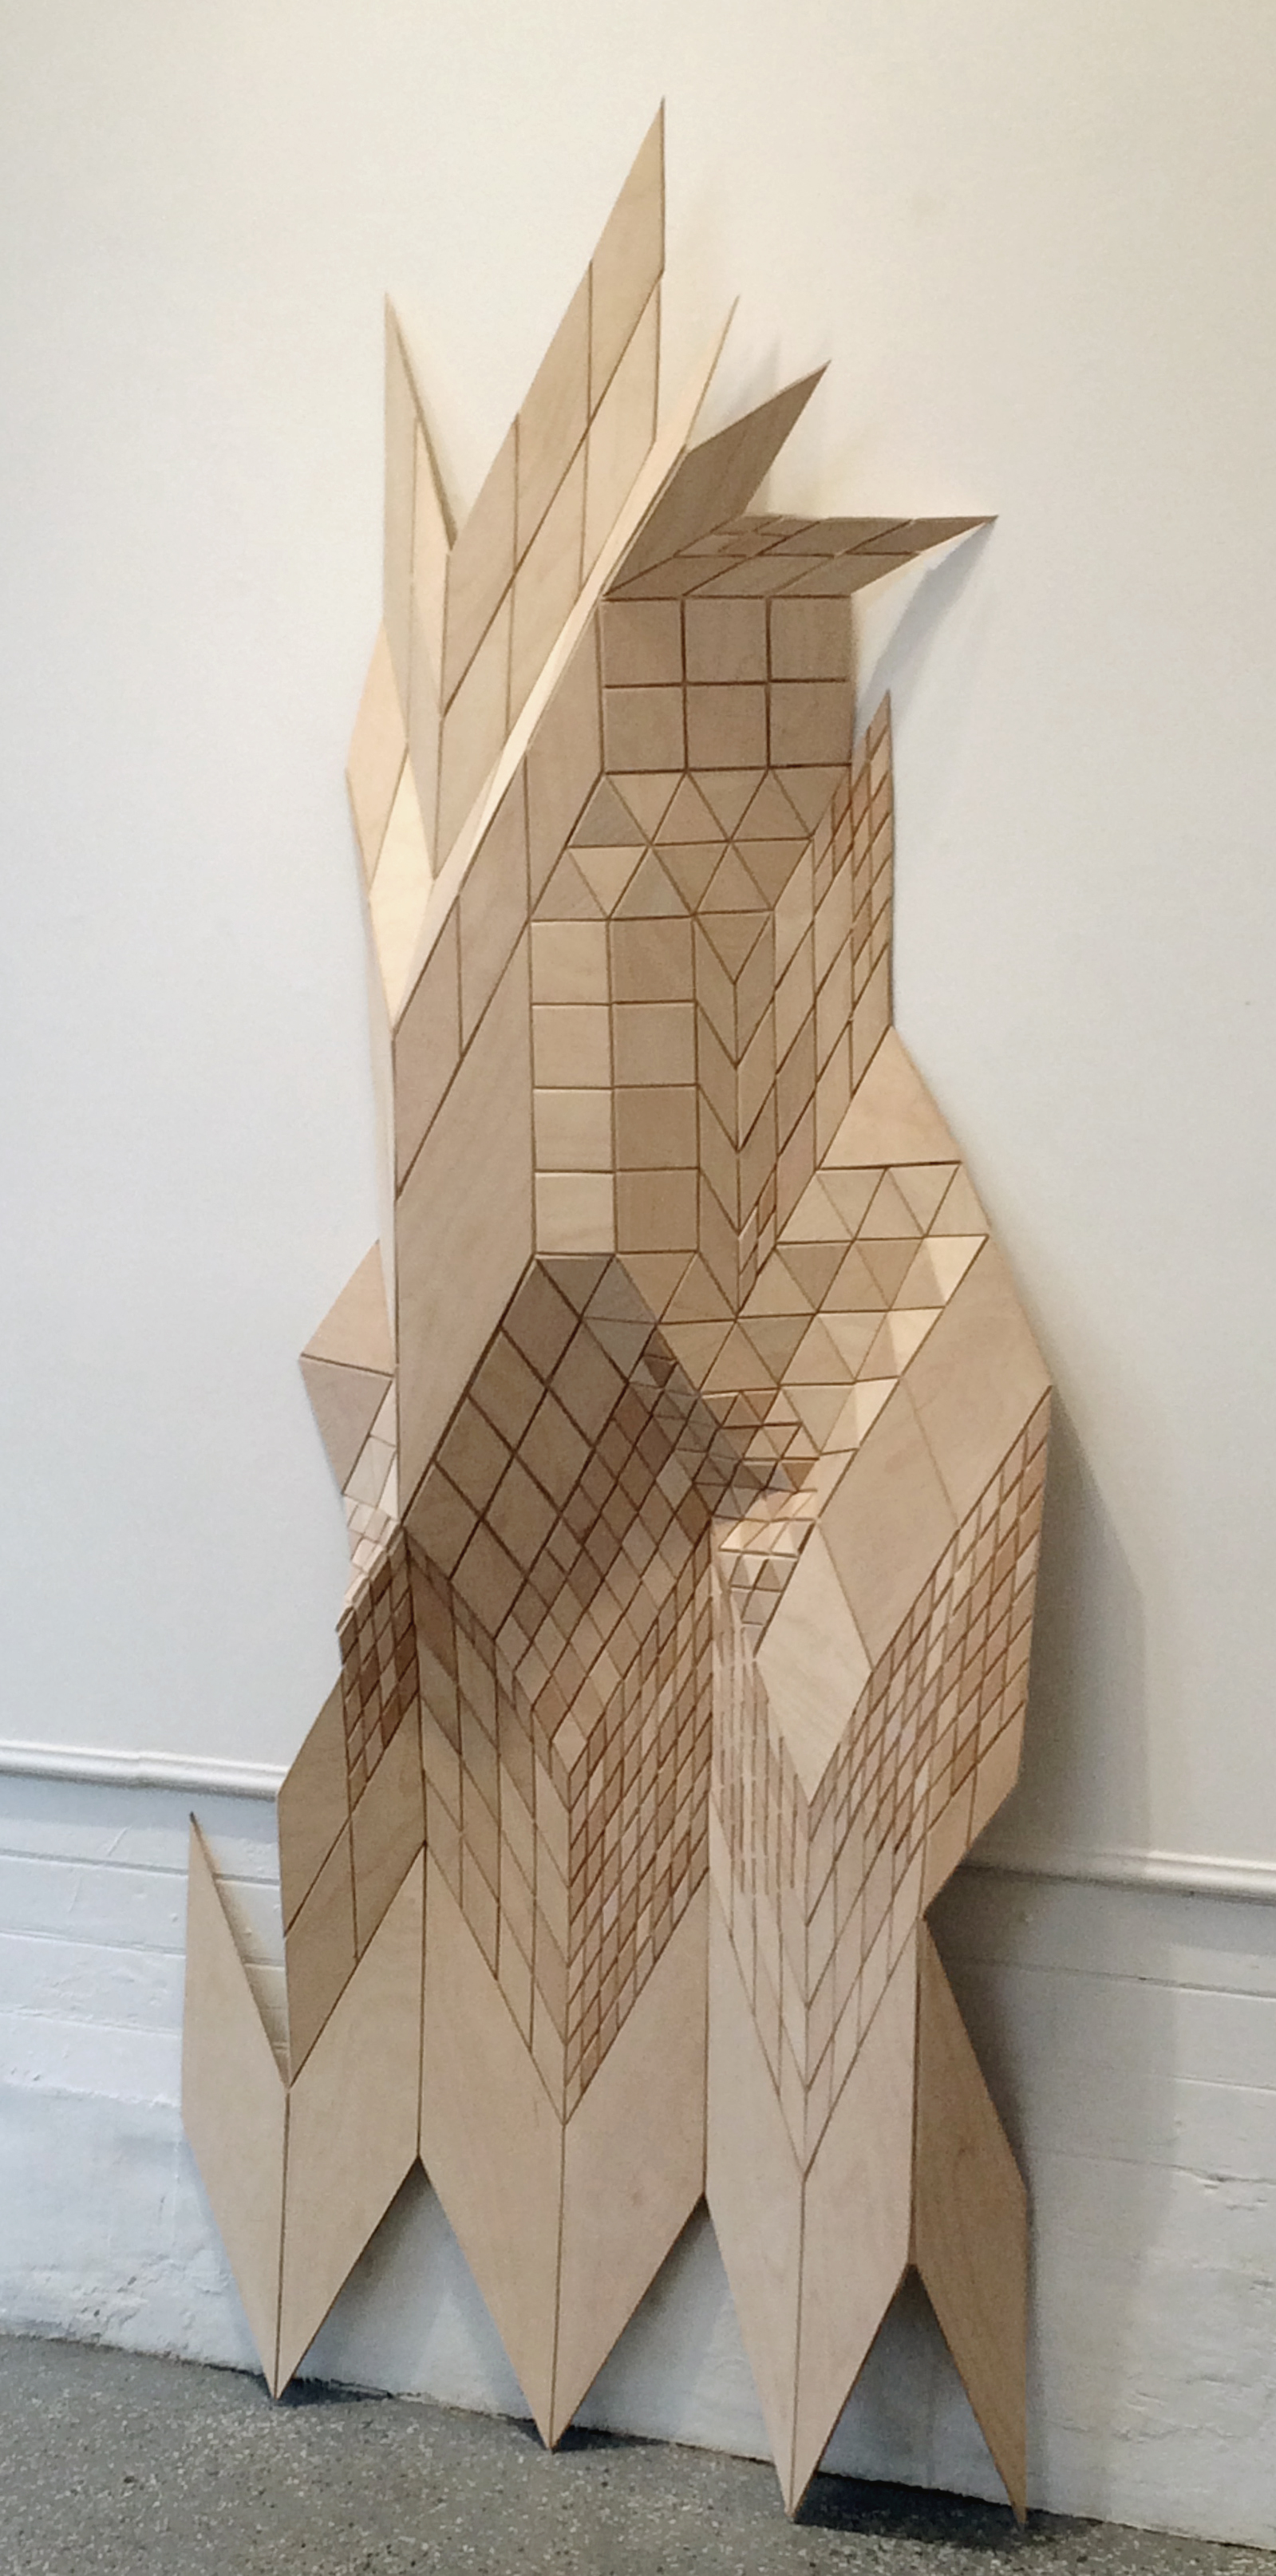 Tiling Field Shift #3